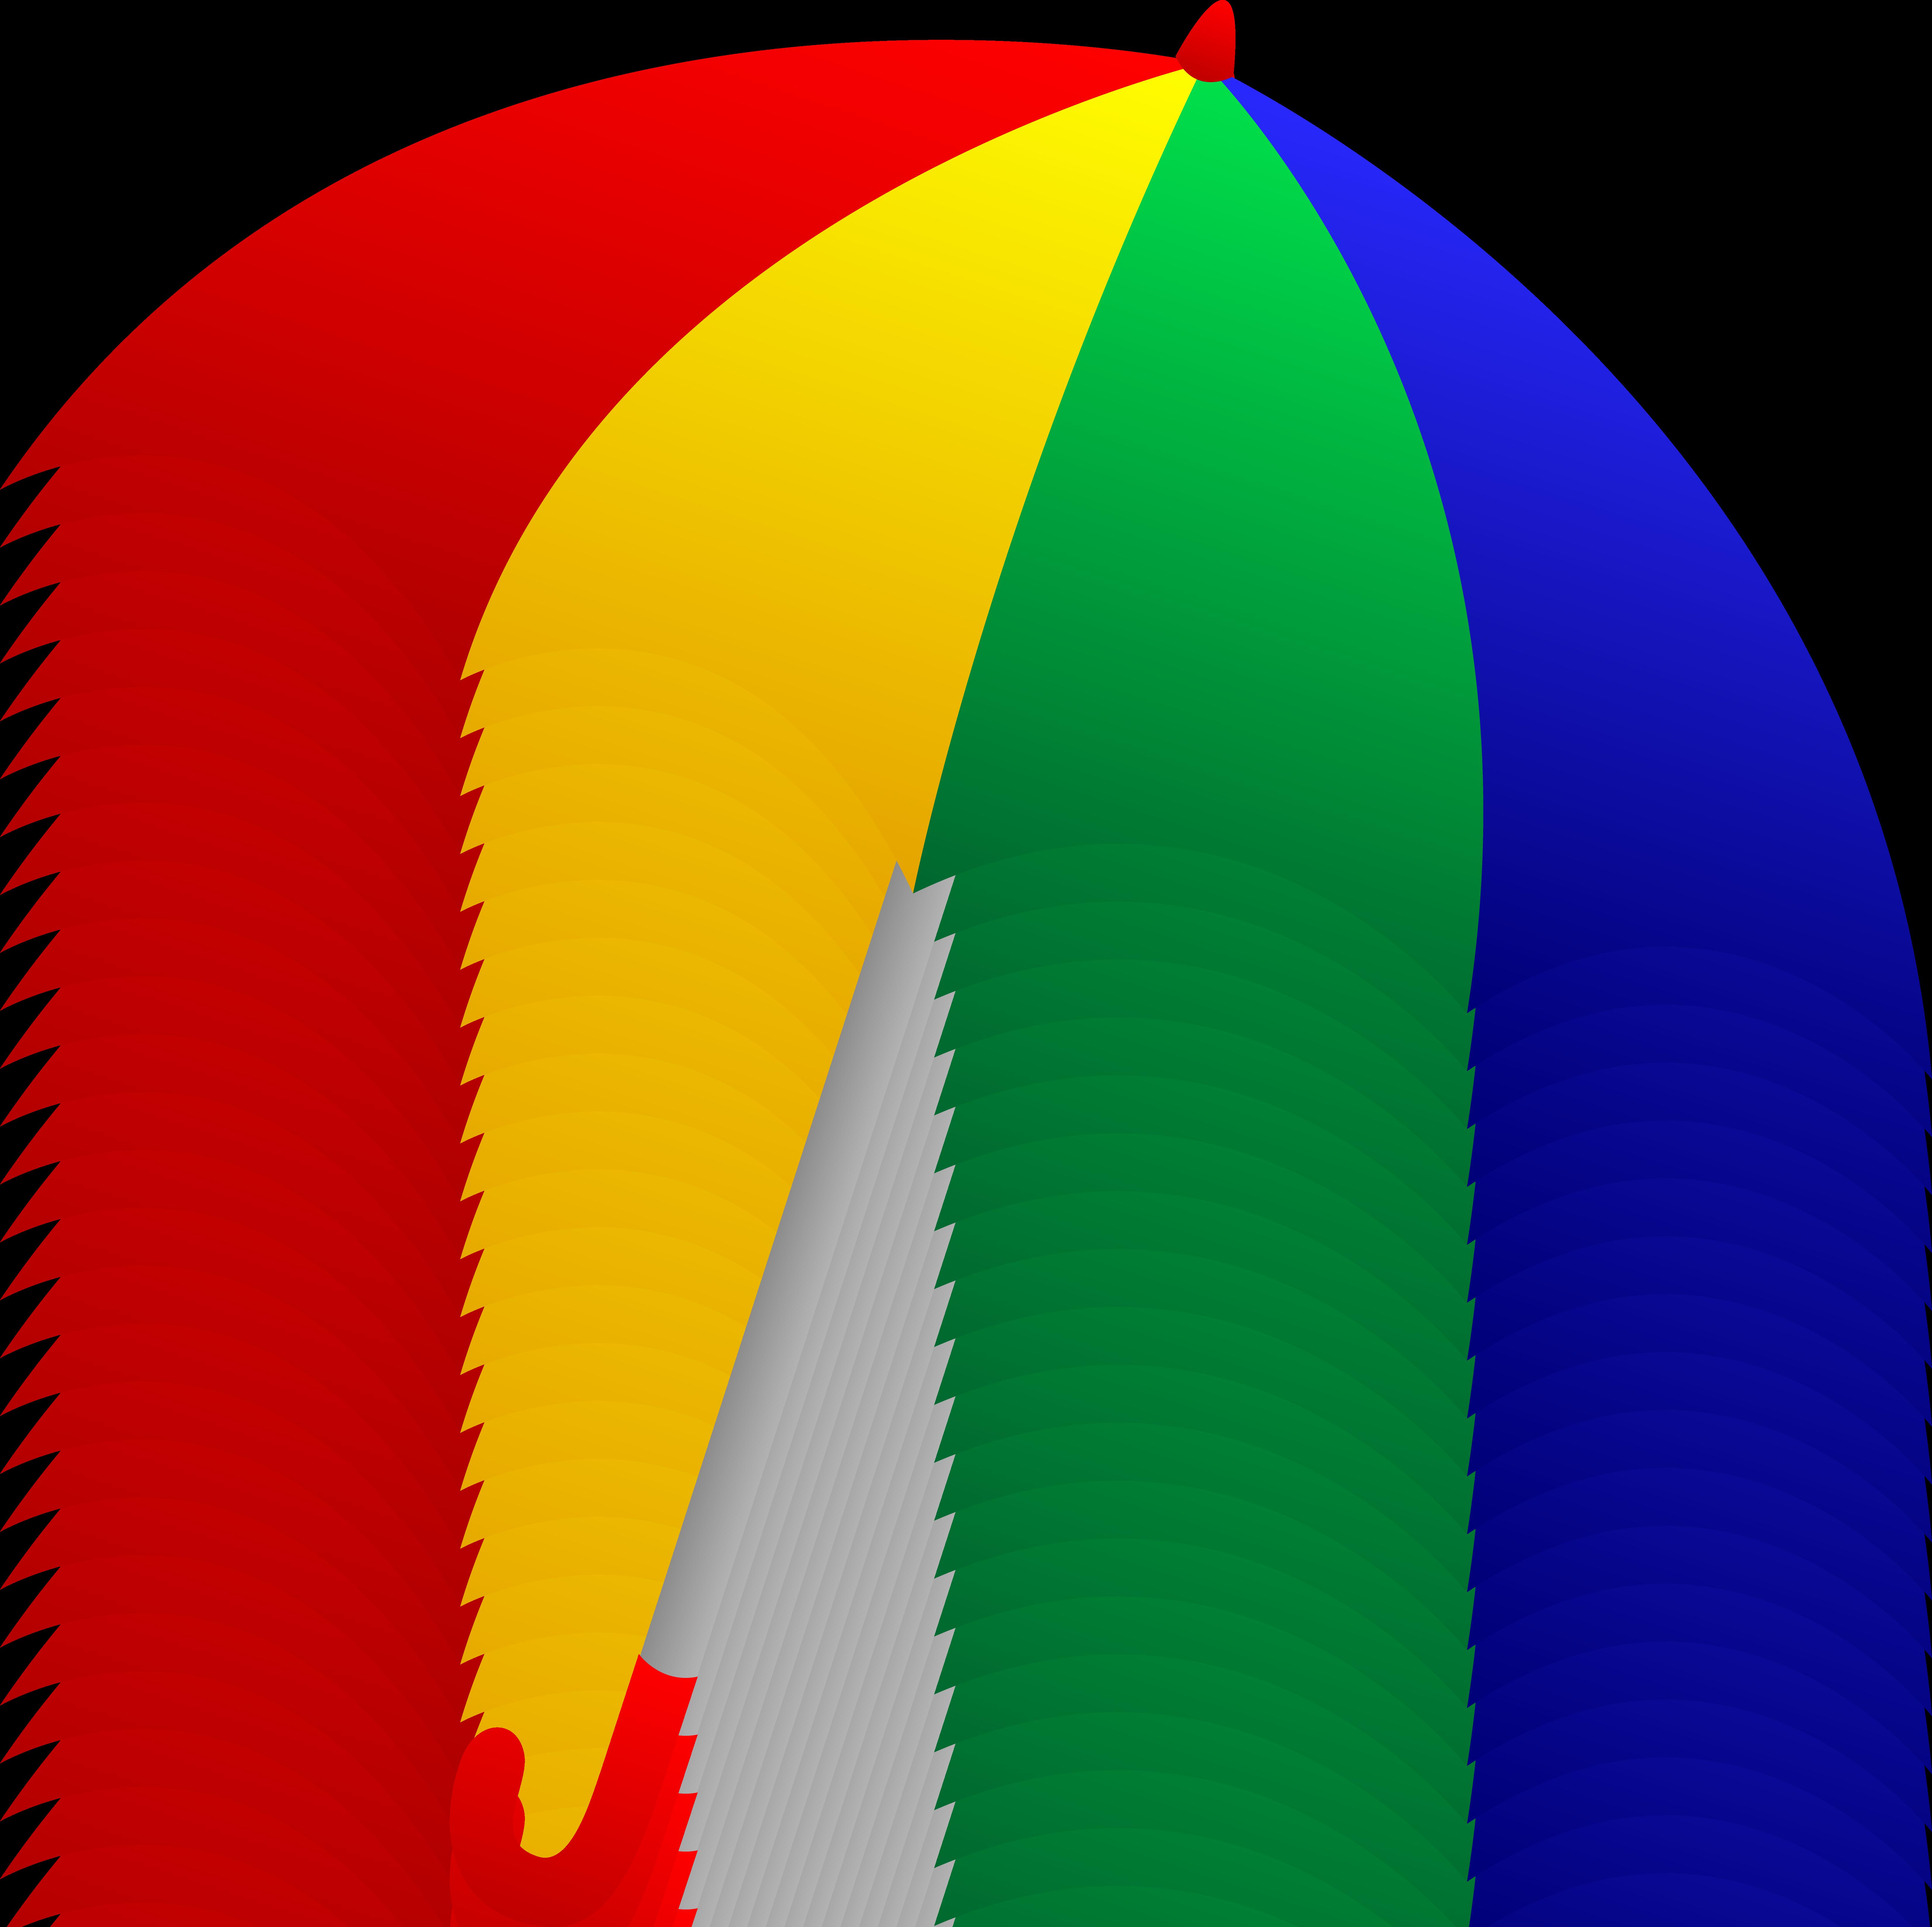 Umbrella Clip Art Free Download | Clipart Panda - Free Clipart Images jpg royalty free stock